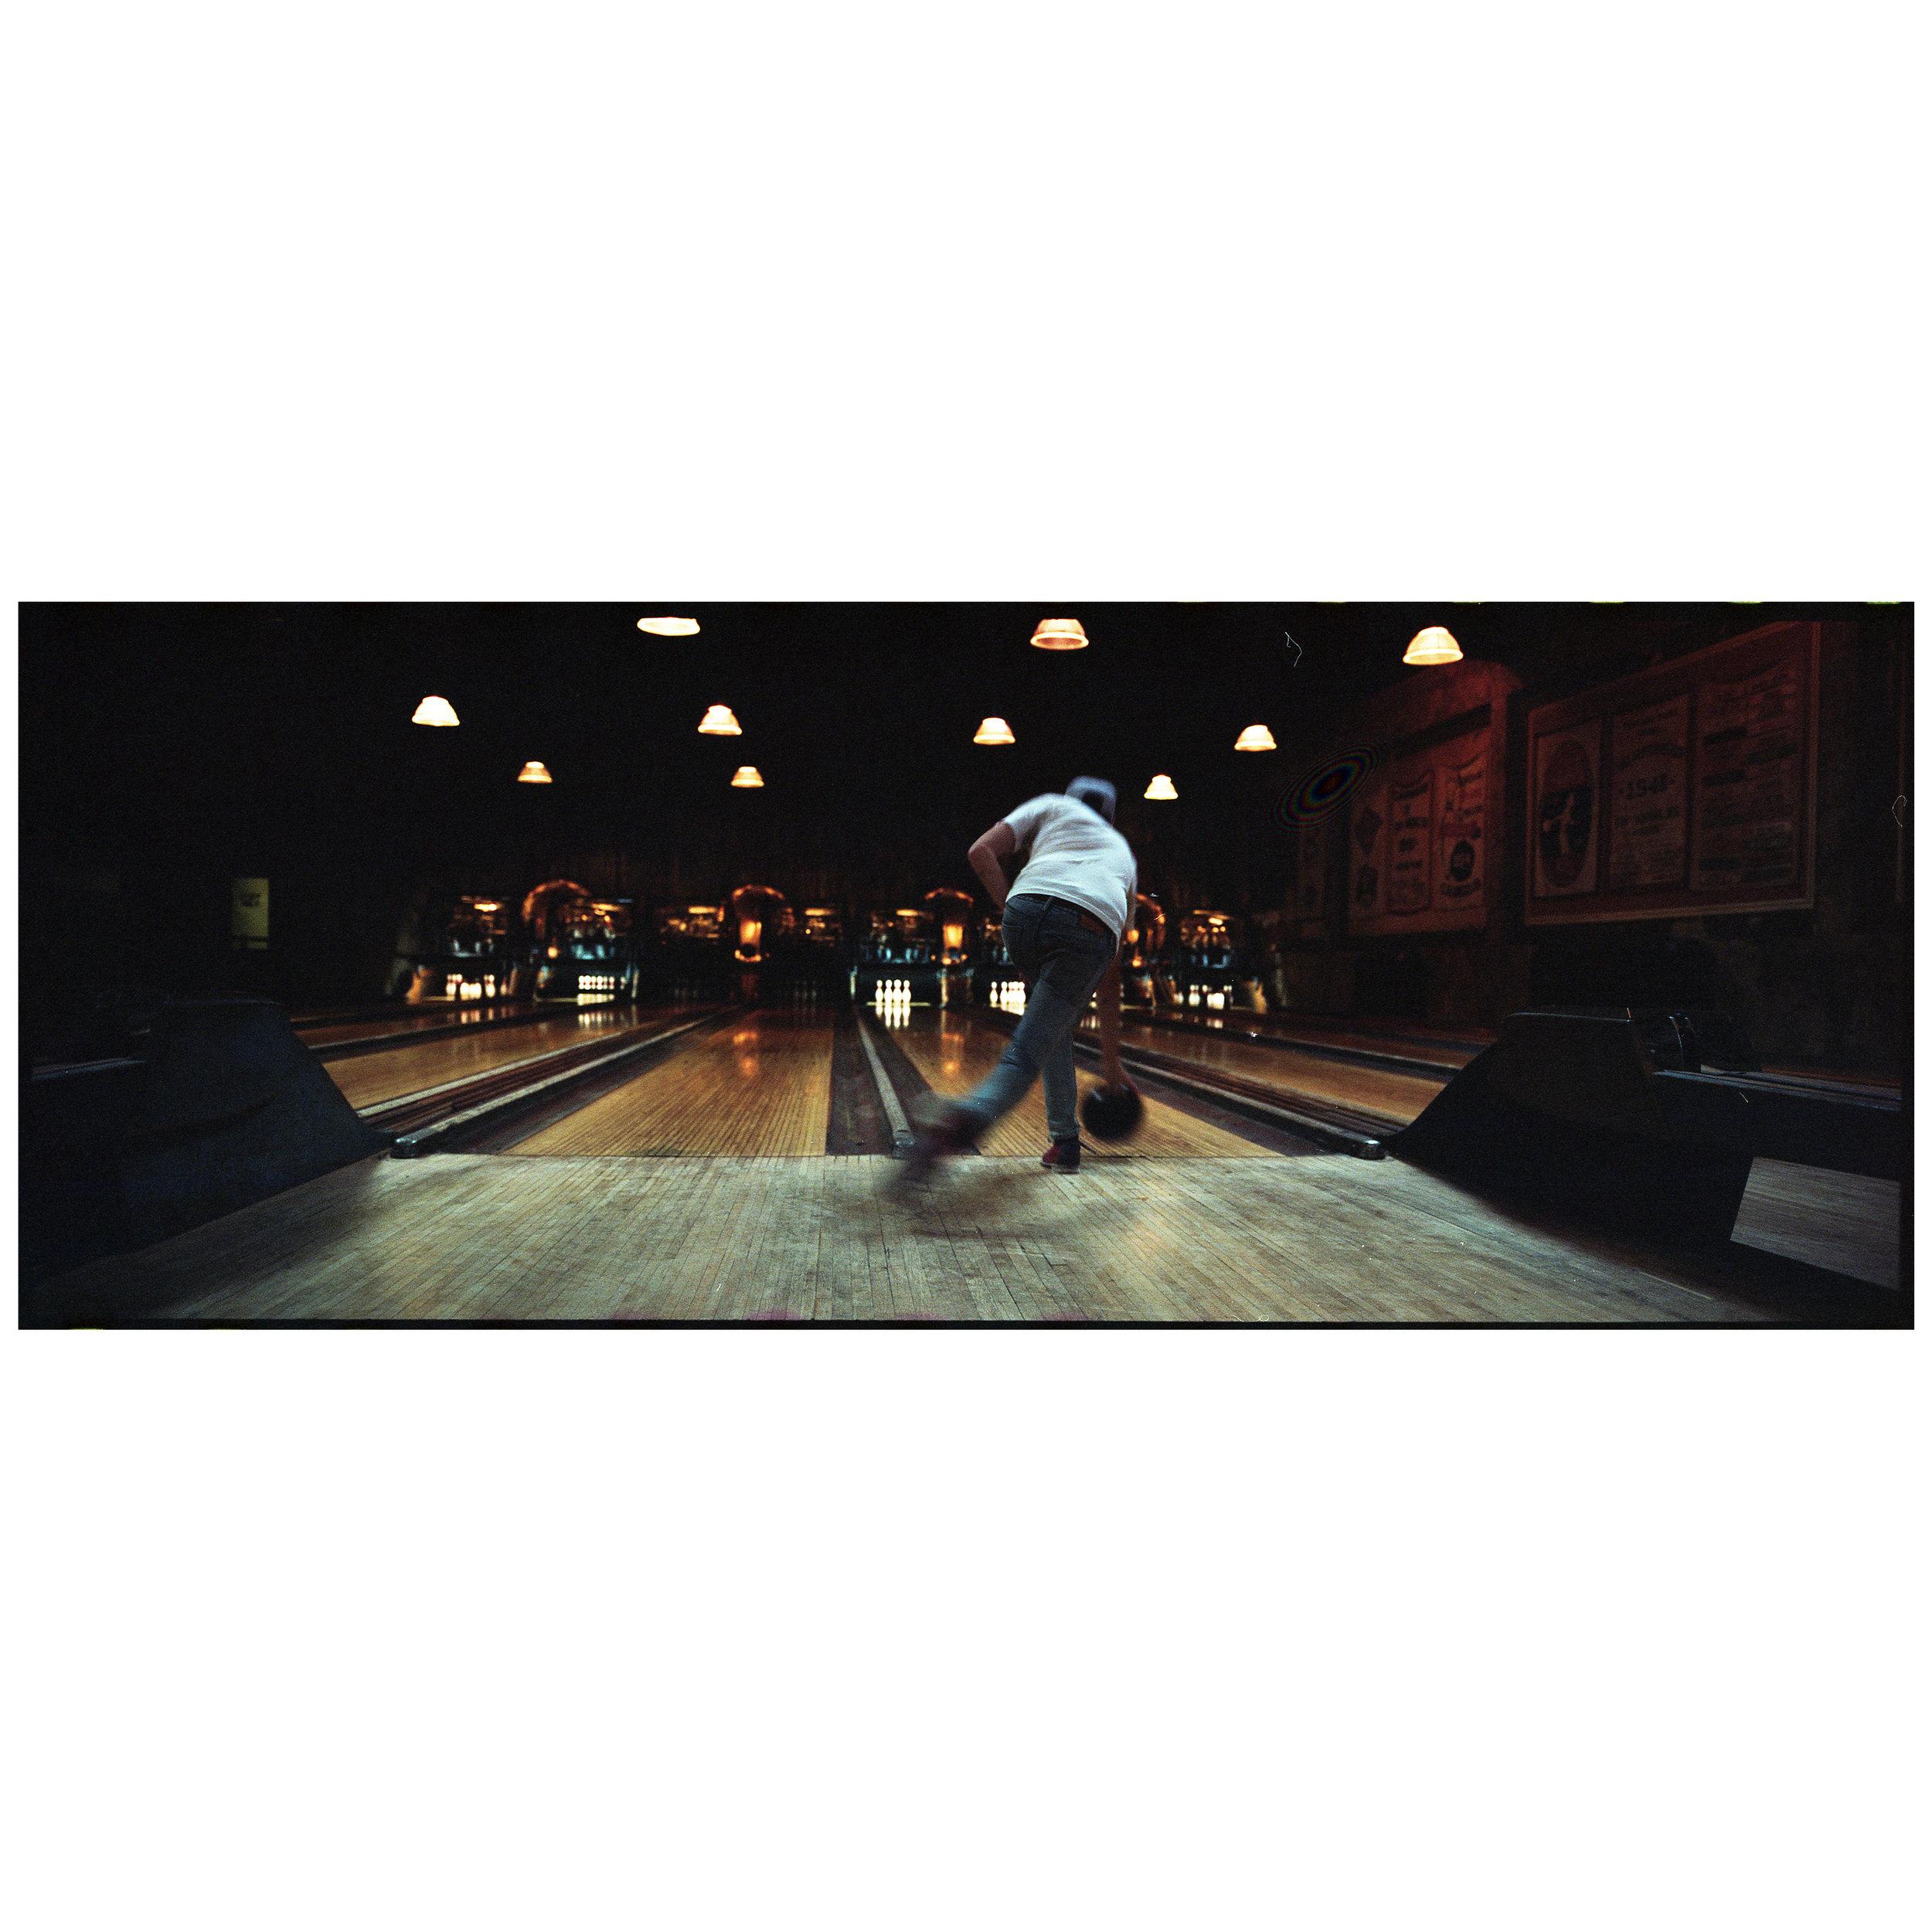 Strike | Hasselblad | XPan II | Gabe Diaz